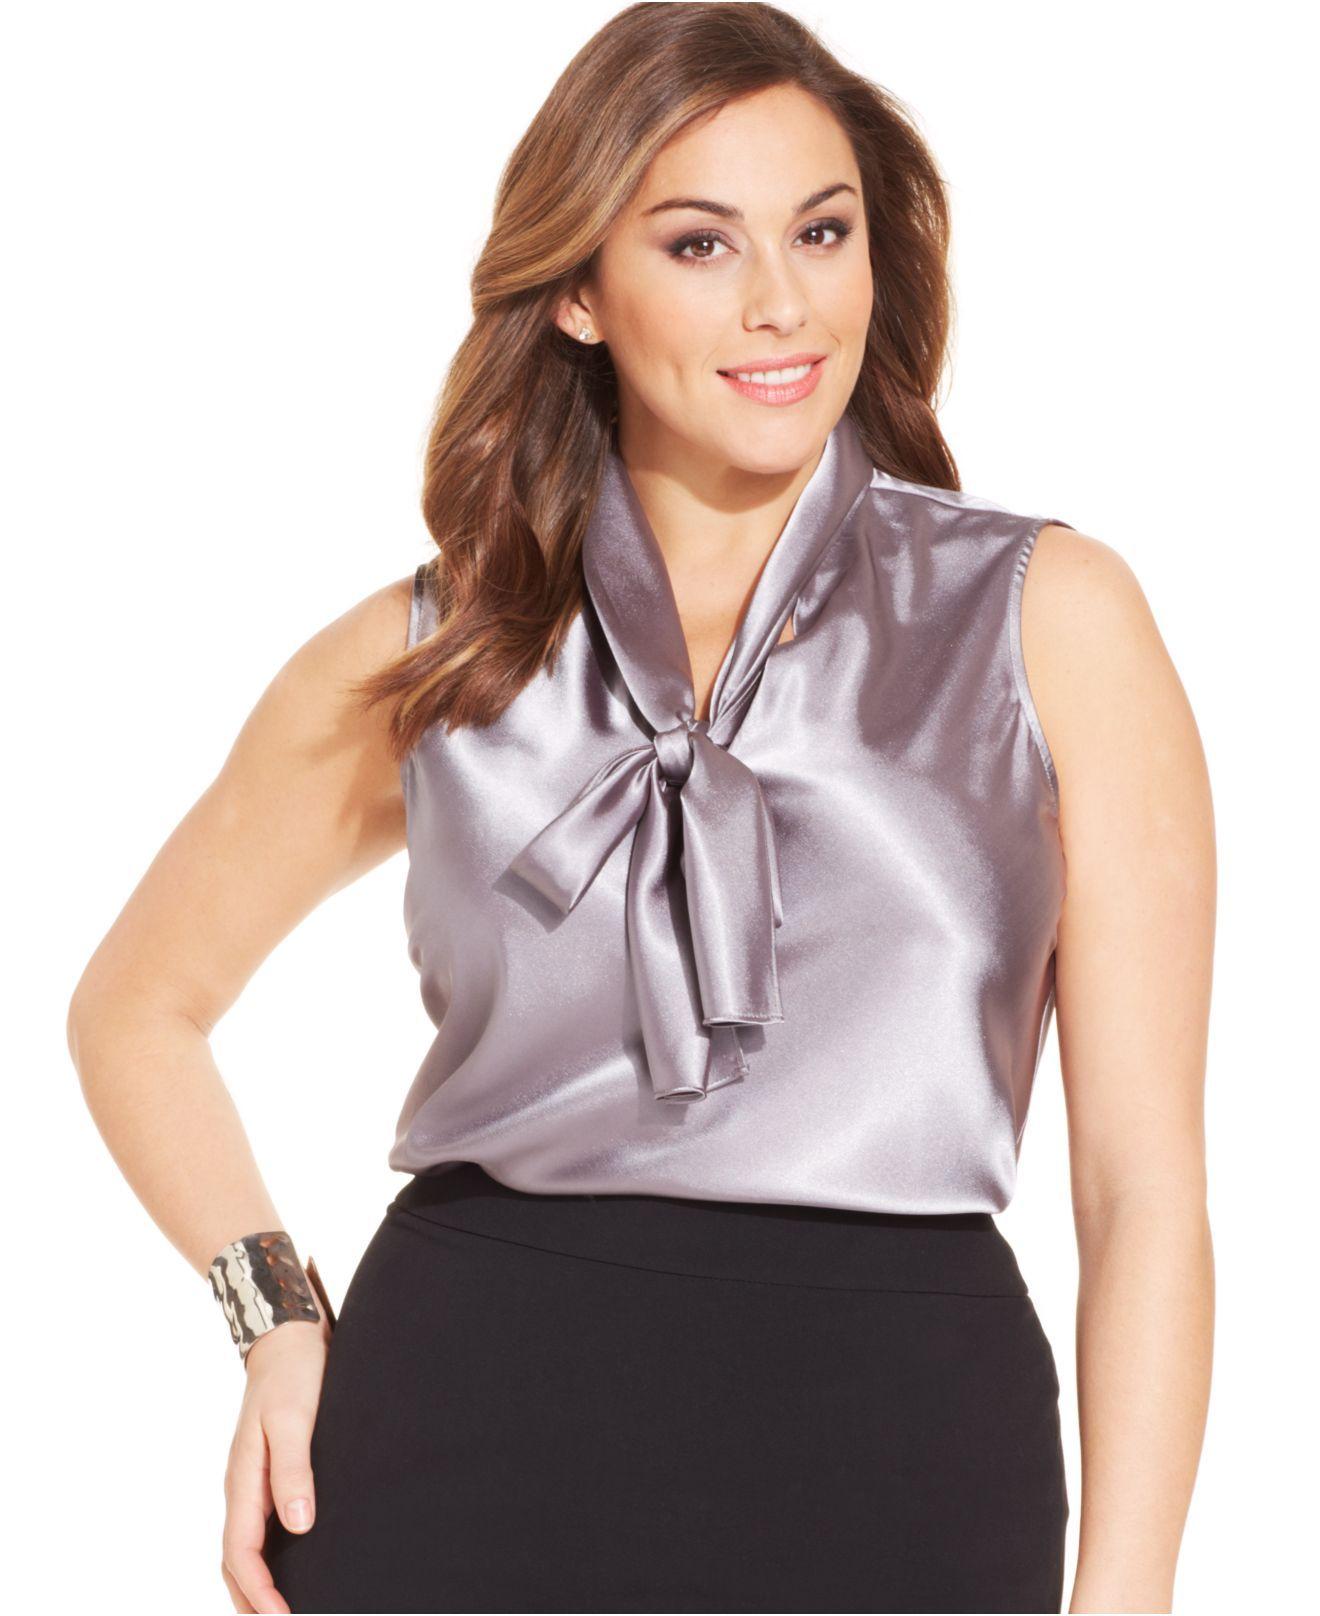 c952847dc90 Nine West Plus Size Sleeveless Tie-Neck Blouse in Purple (Platinum ...